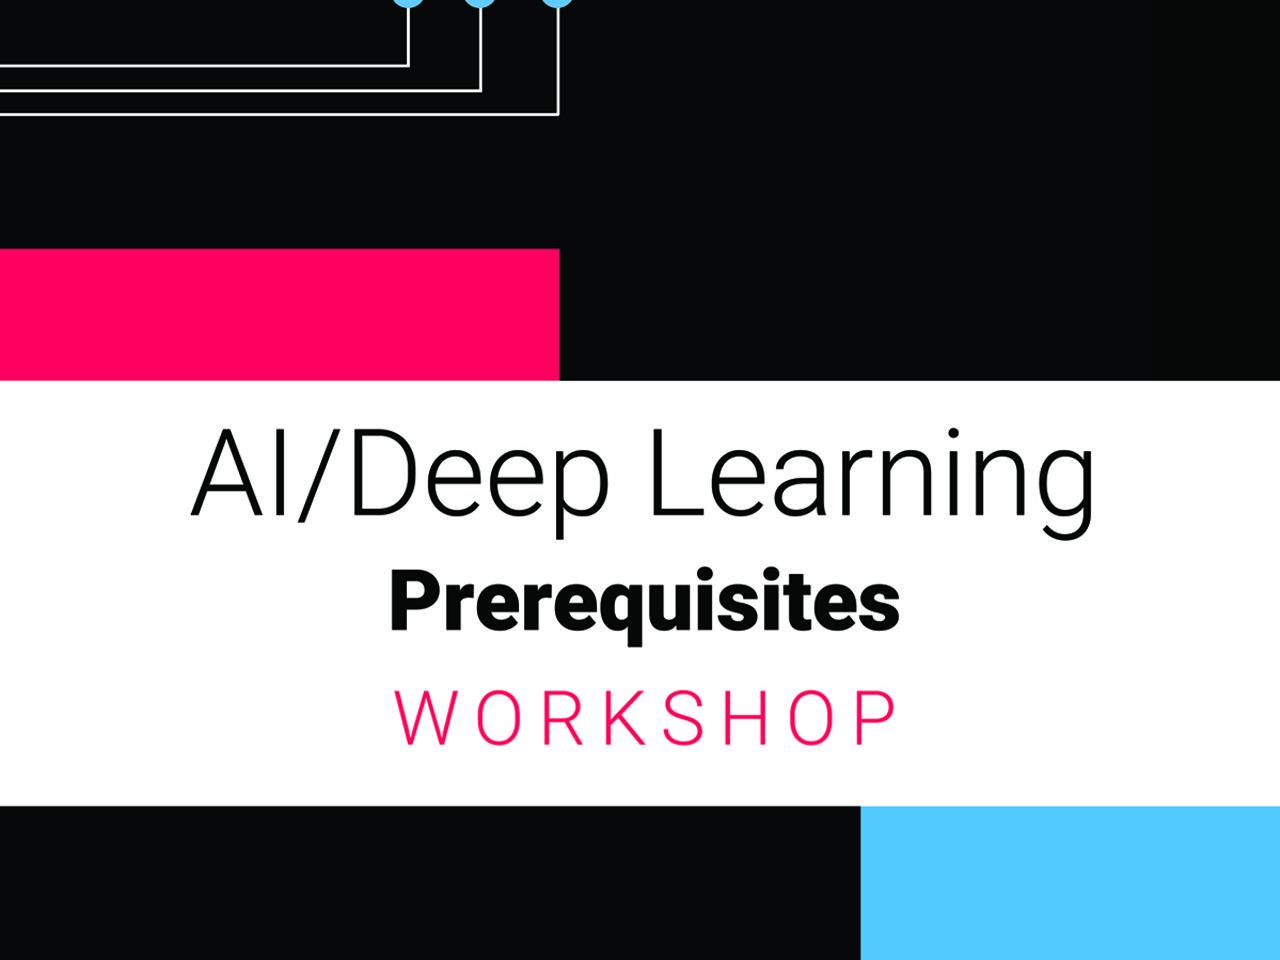 Workshop on AI/Deep Learning | Intel DevMesh